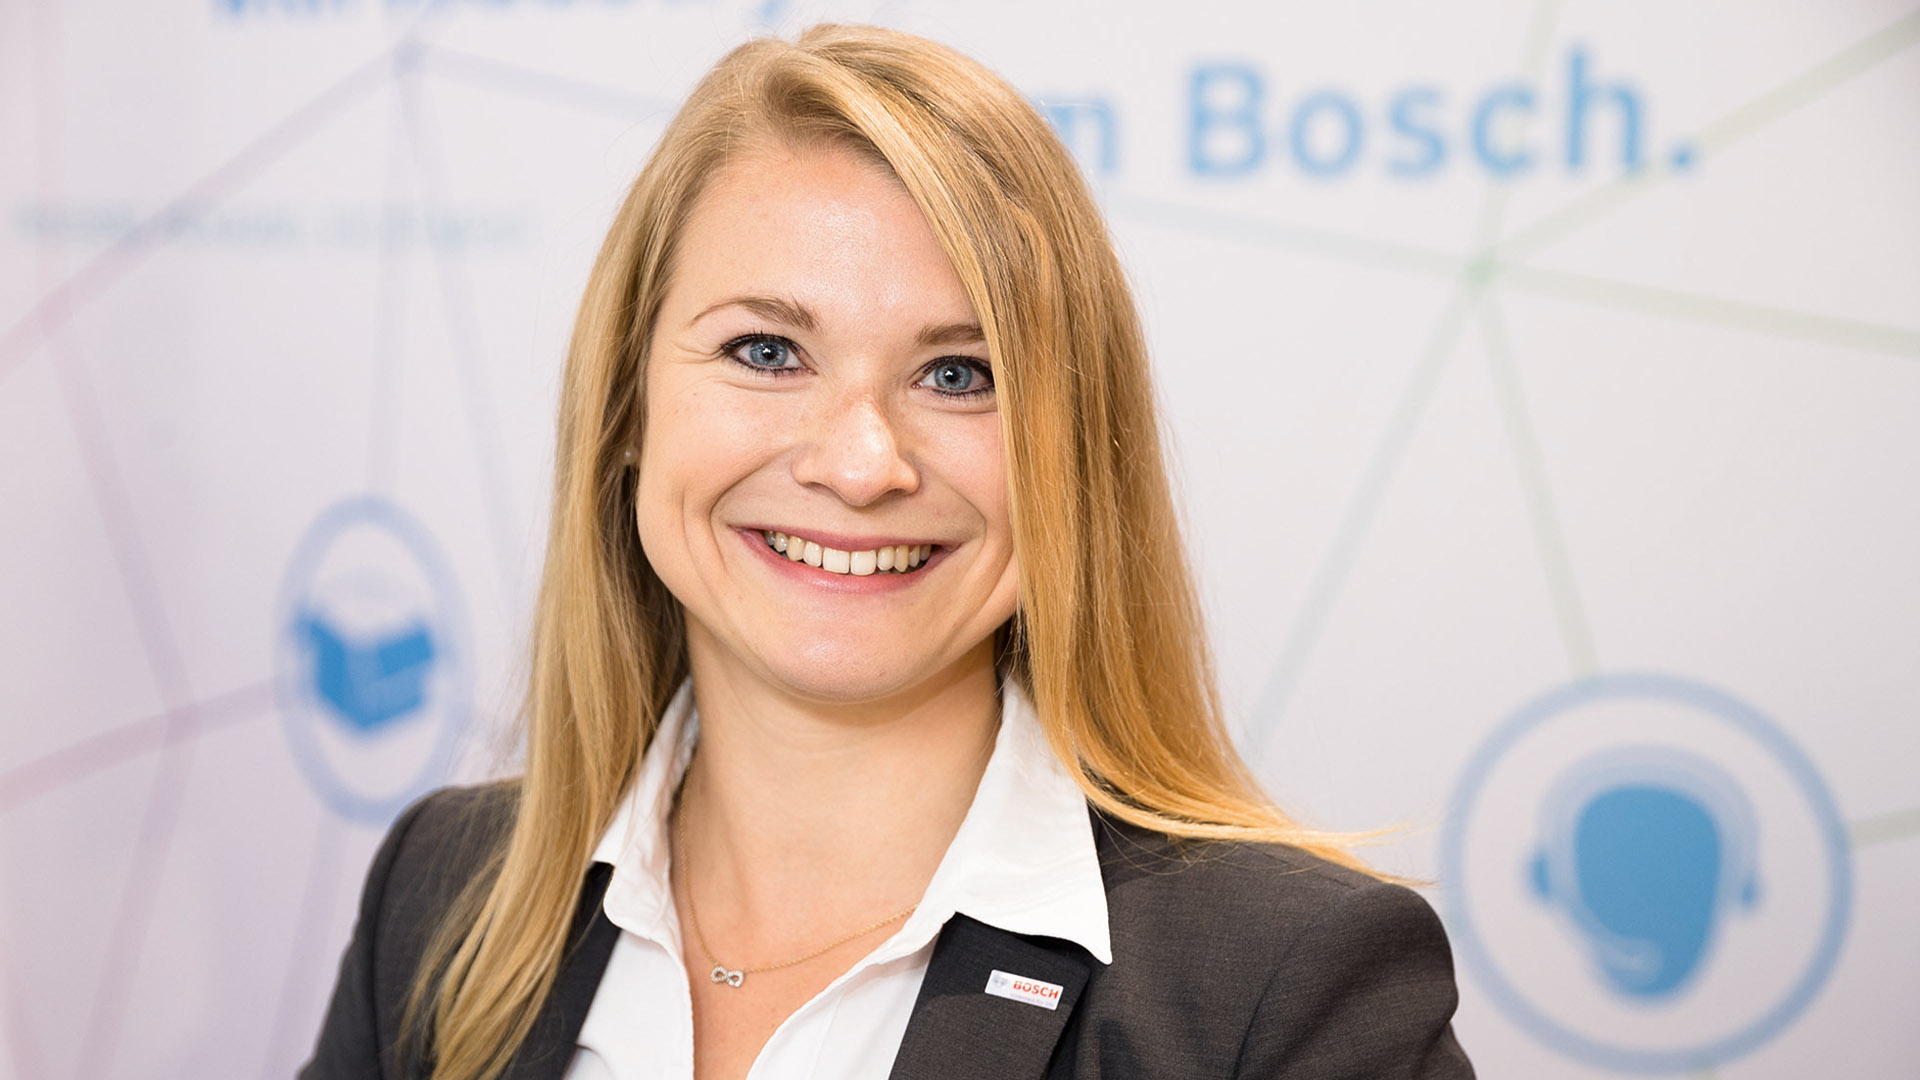 Angelina Bosse